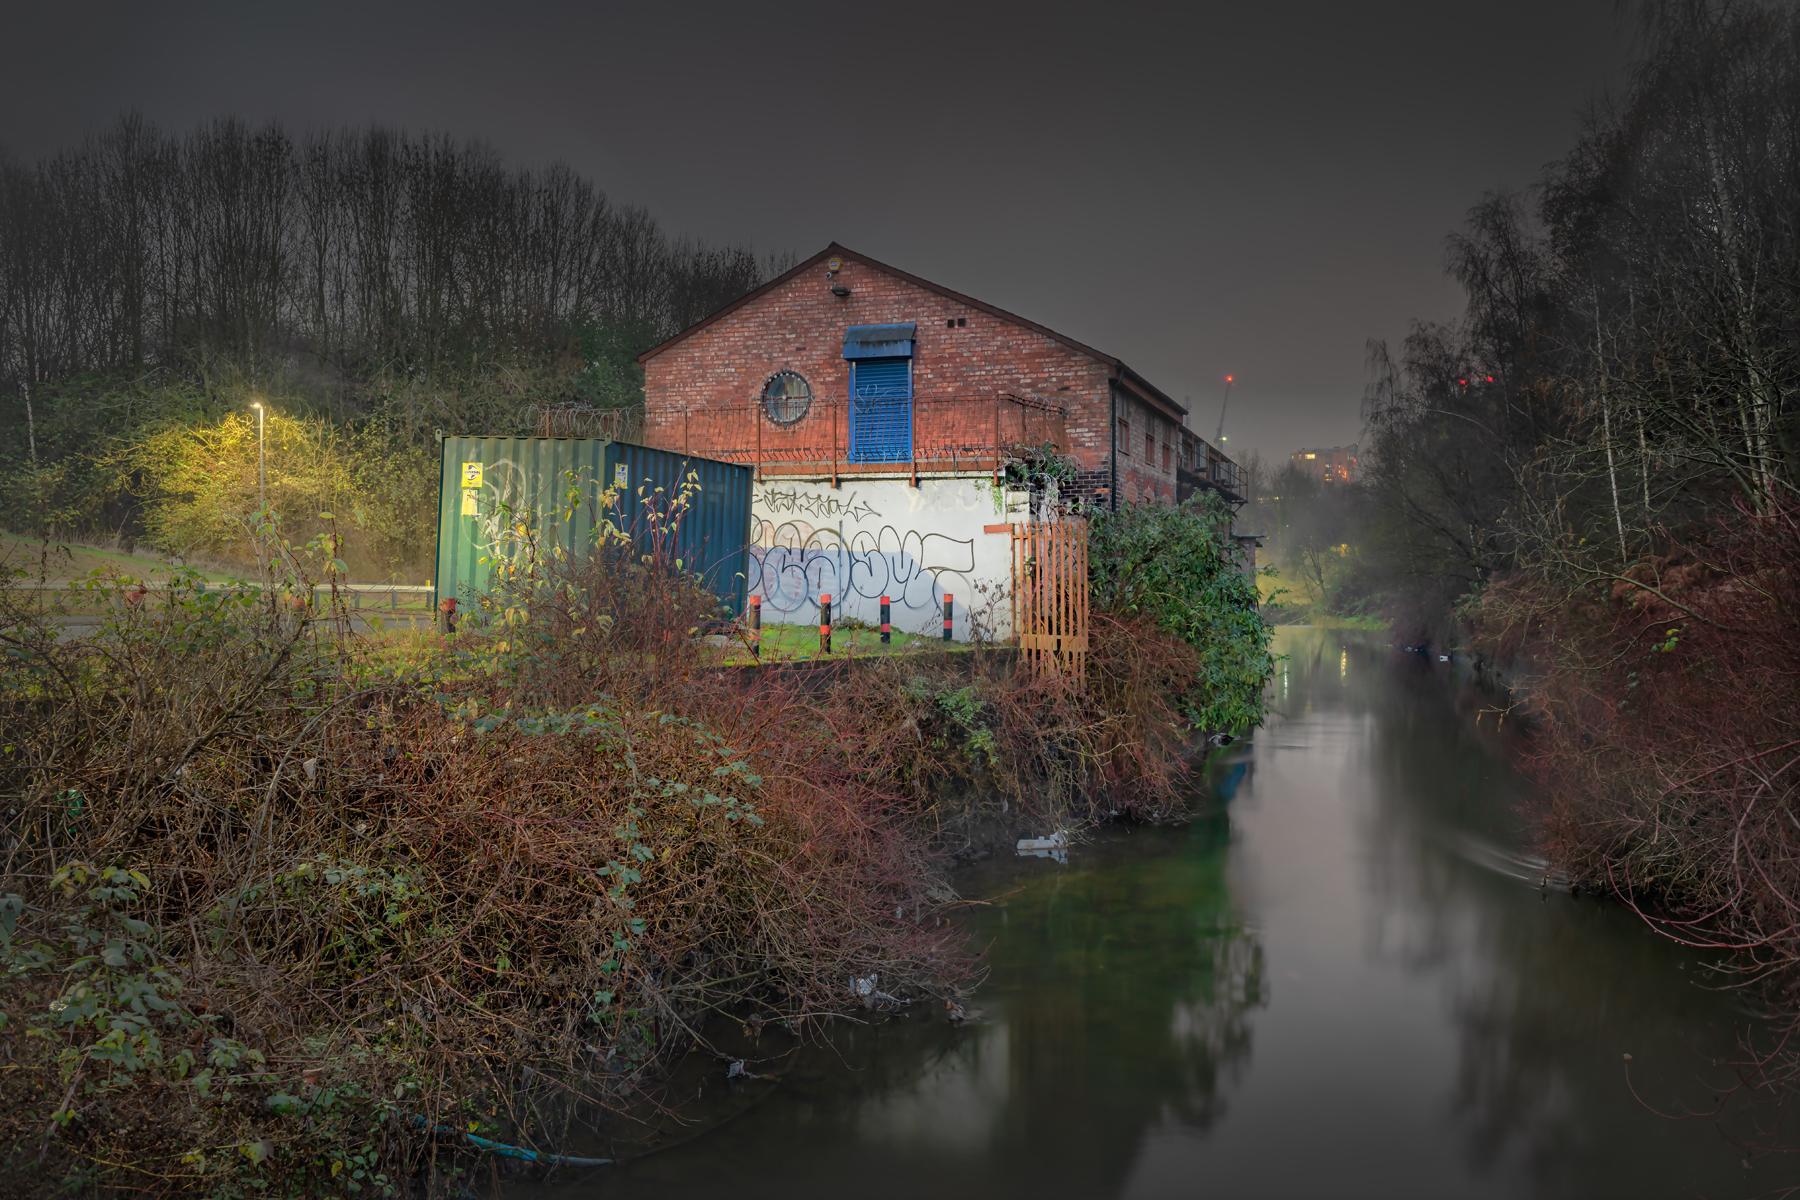 Simon Buckley, River Irk, 4.20pm